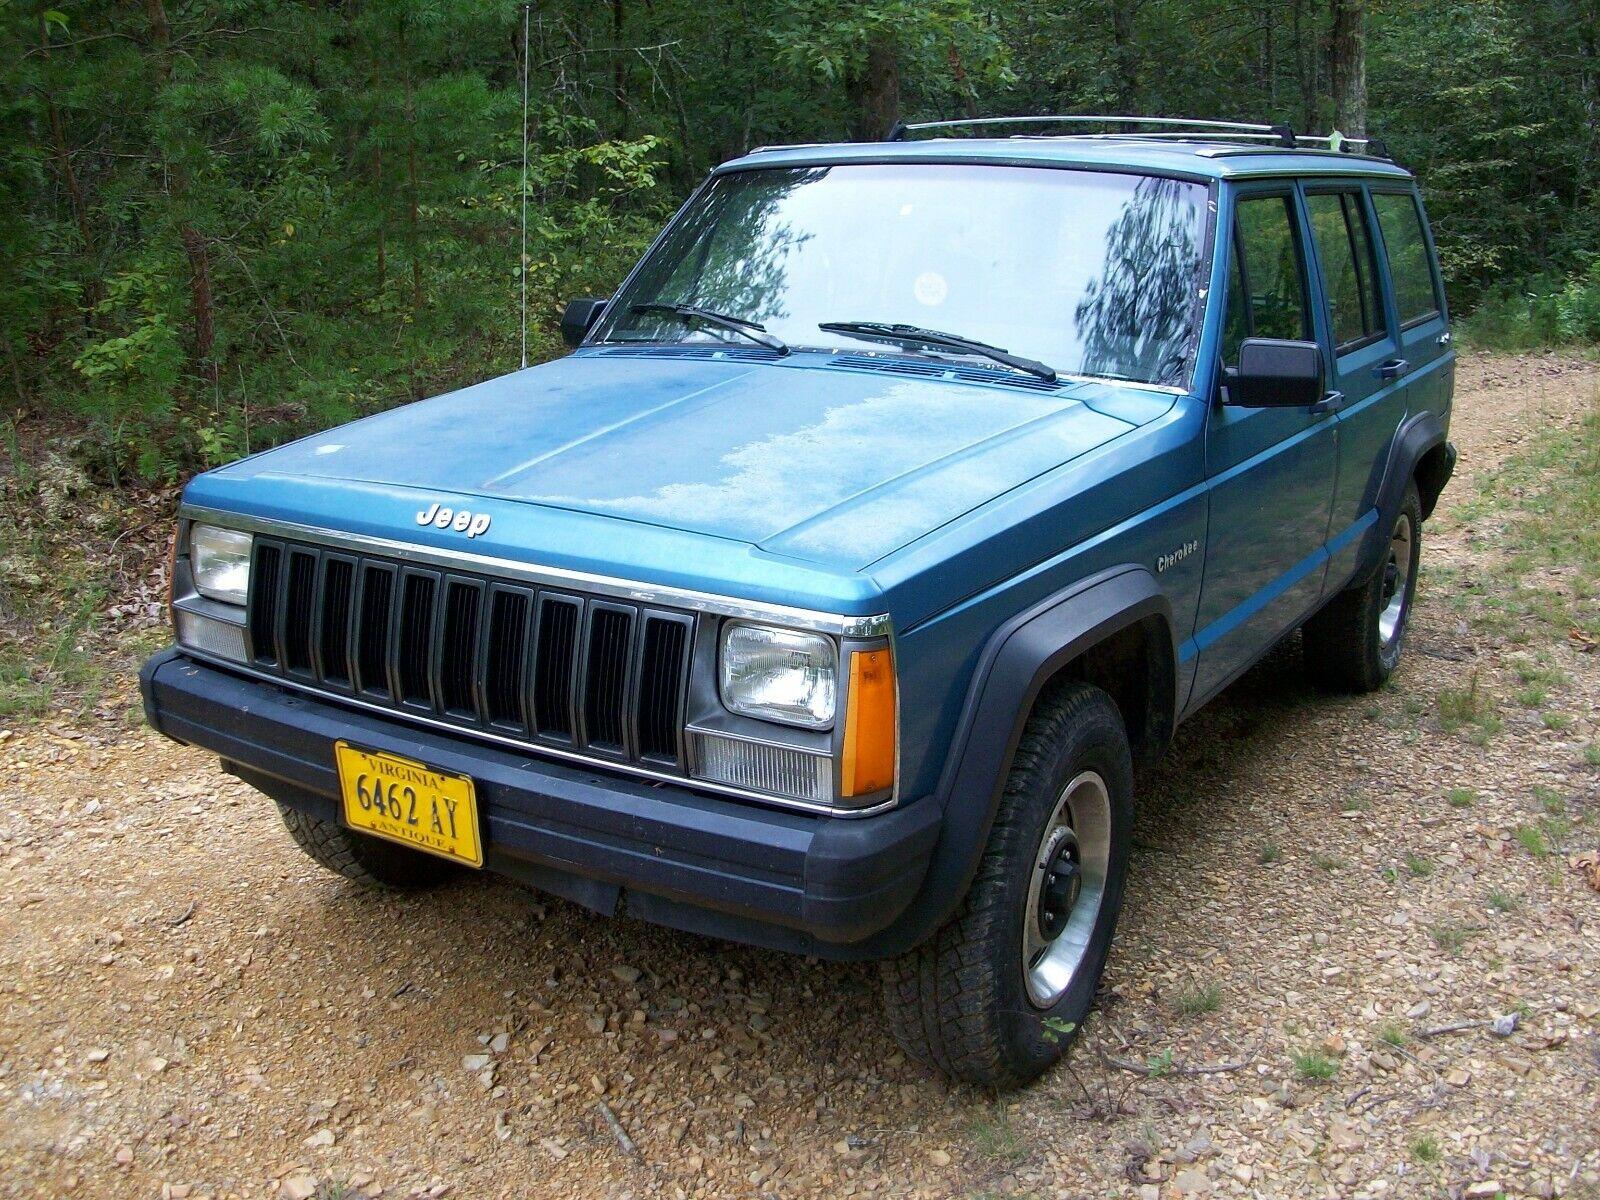 1986 AMC Jeep Cherokee V6 AT 4X4 126K Orig. Paint, No rust Survivor! ON YouTube!